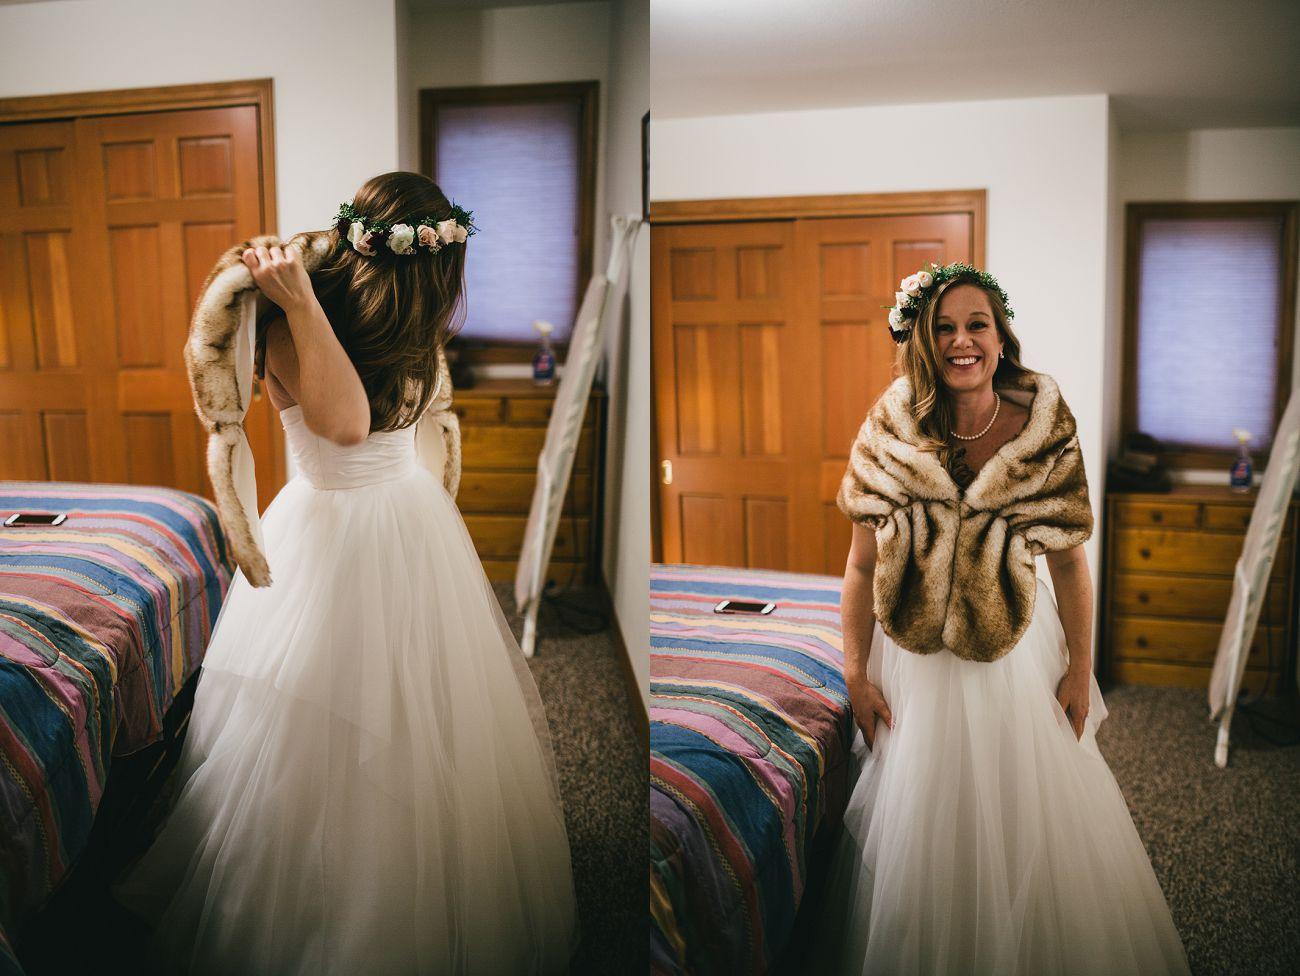 Jennifer_Mooney_Photo_Whitefish_mountain_resort_wedding_elegant_montana_wedding_026.jpg